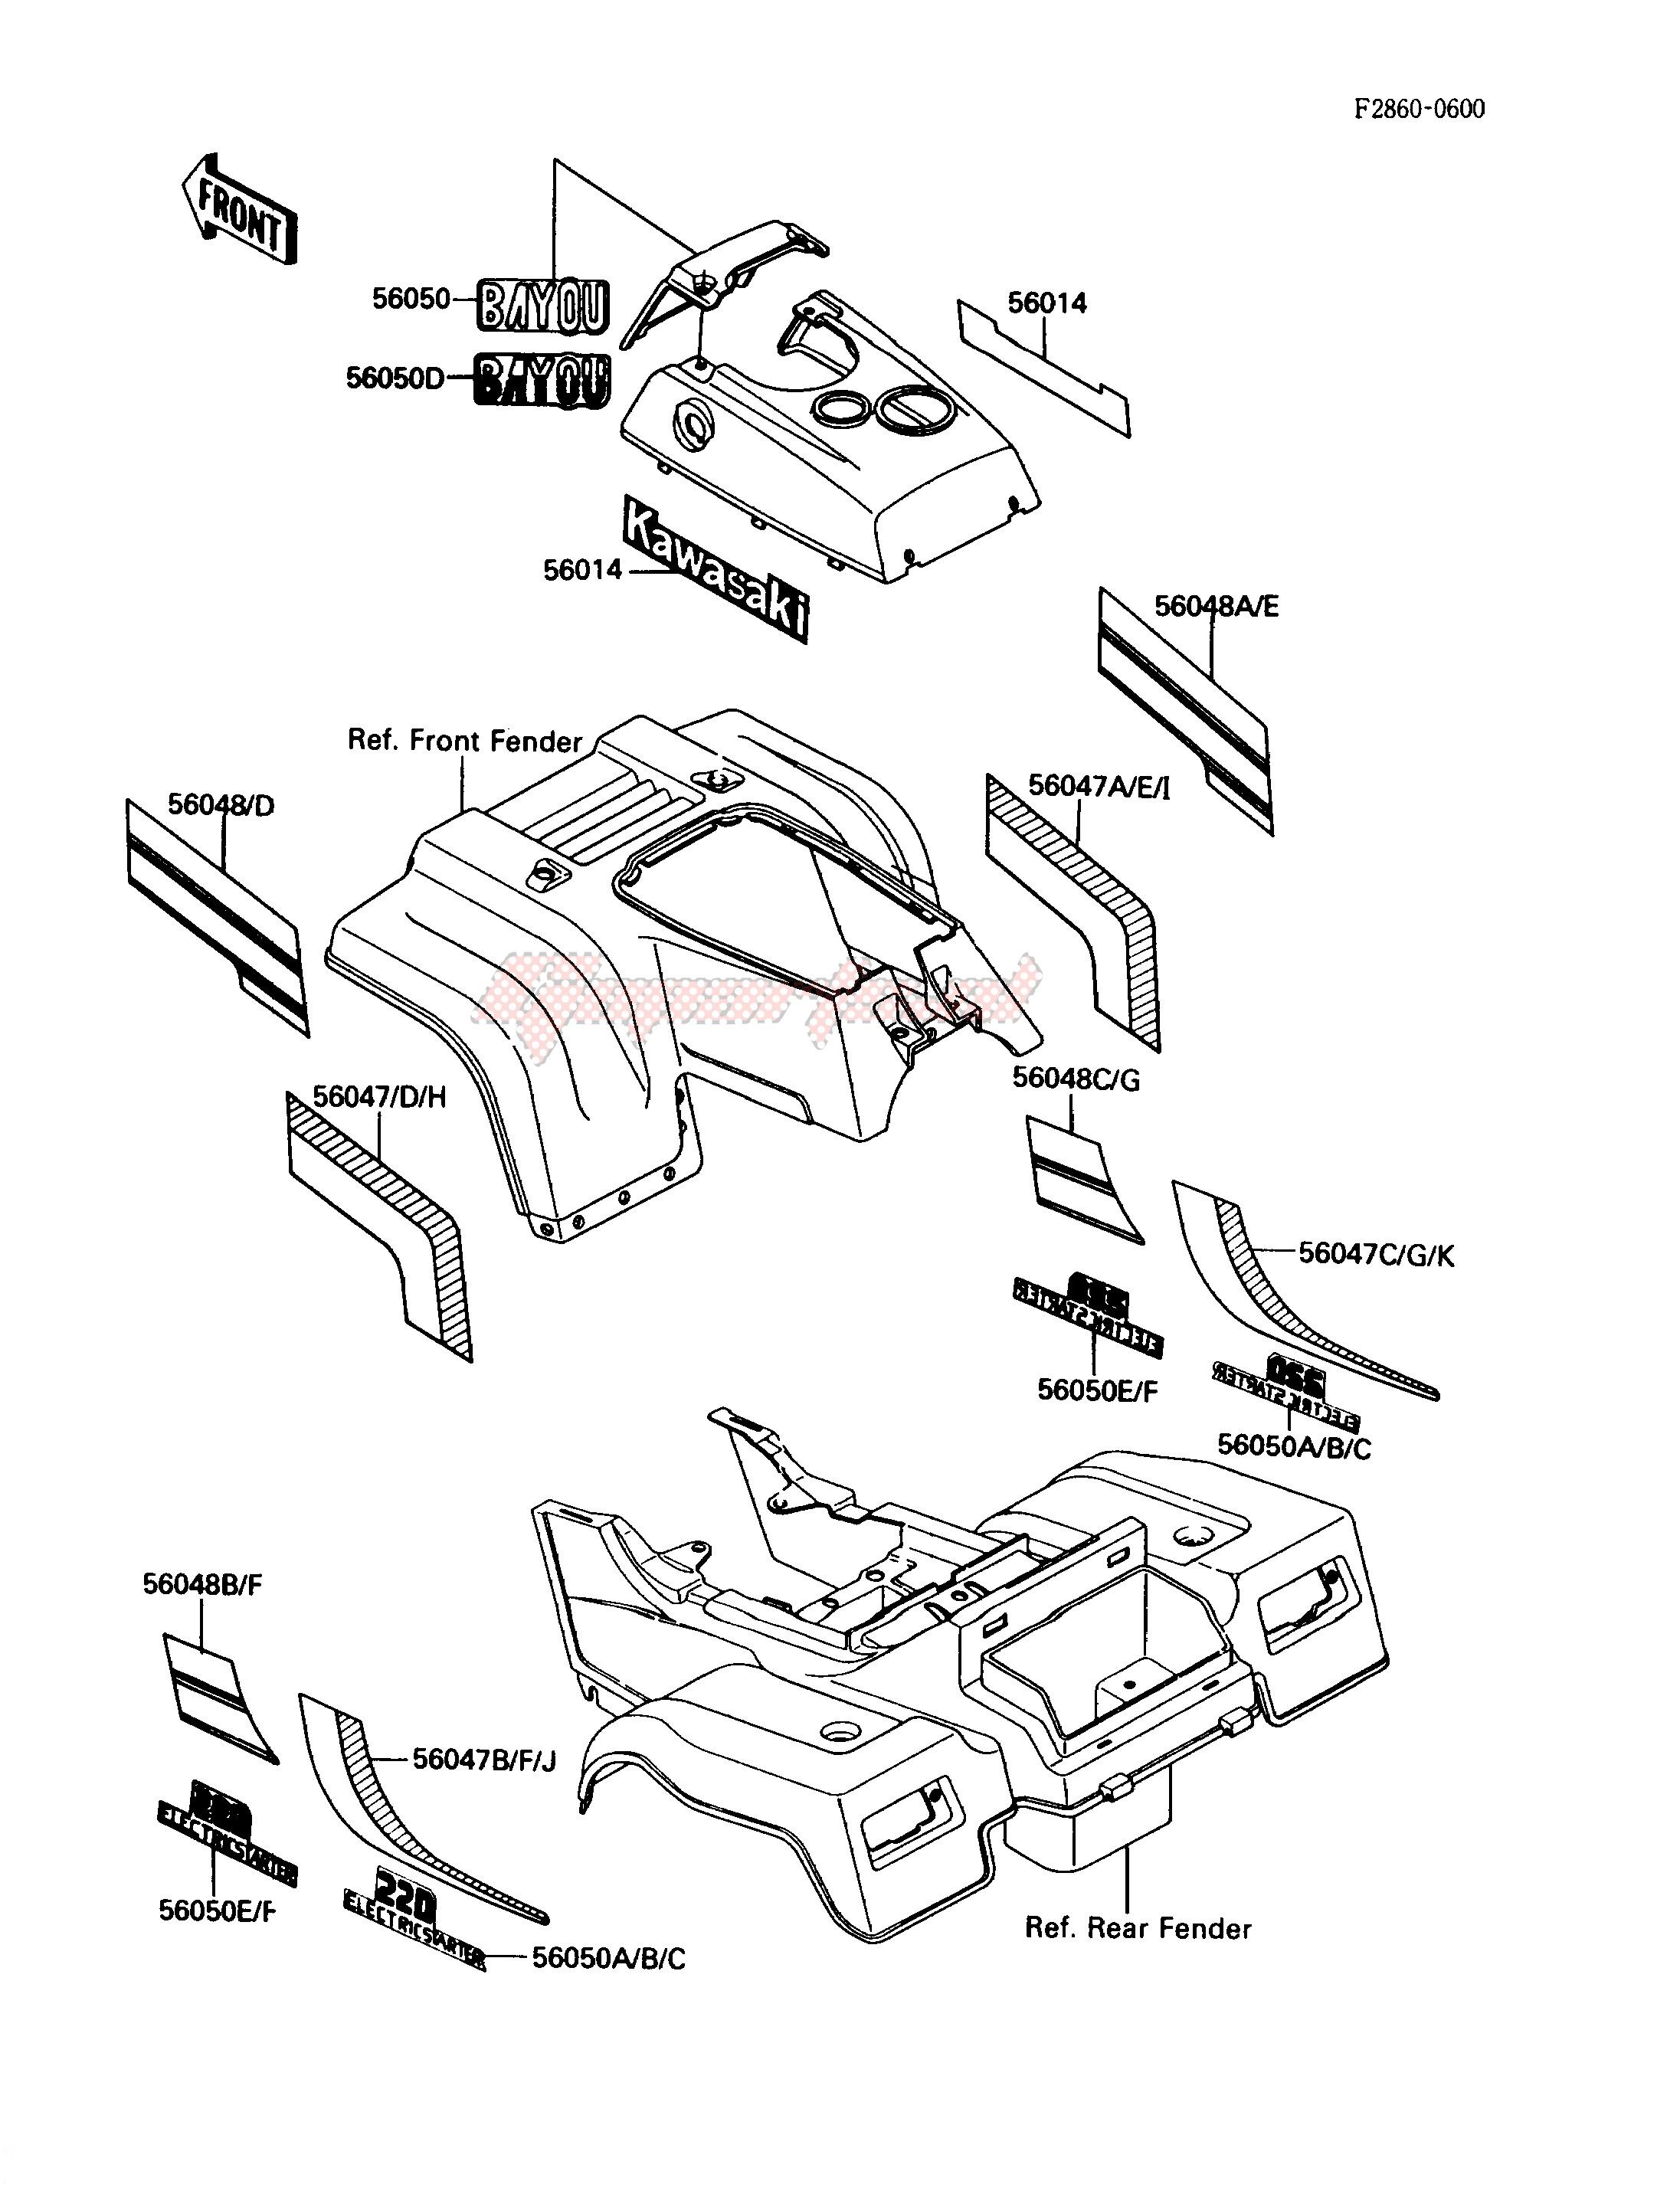 DECAL-- KLF220-A1_A2- - image